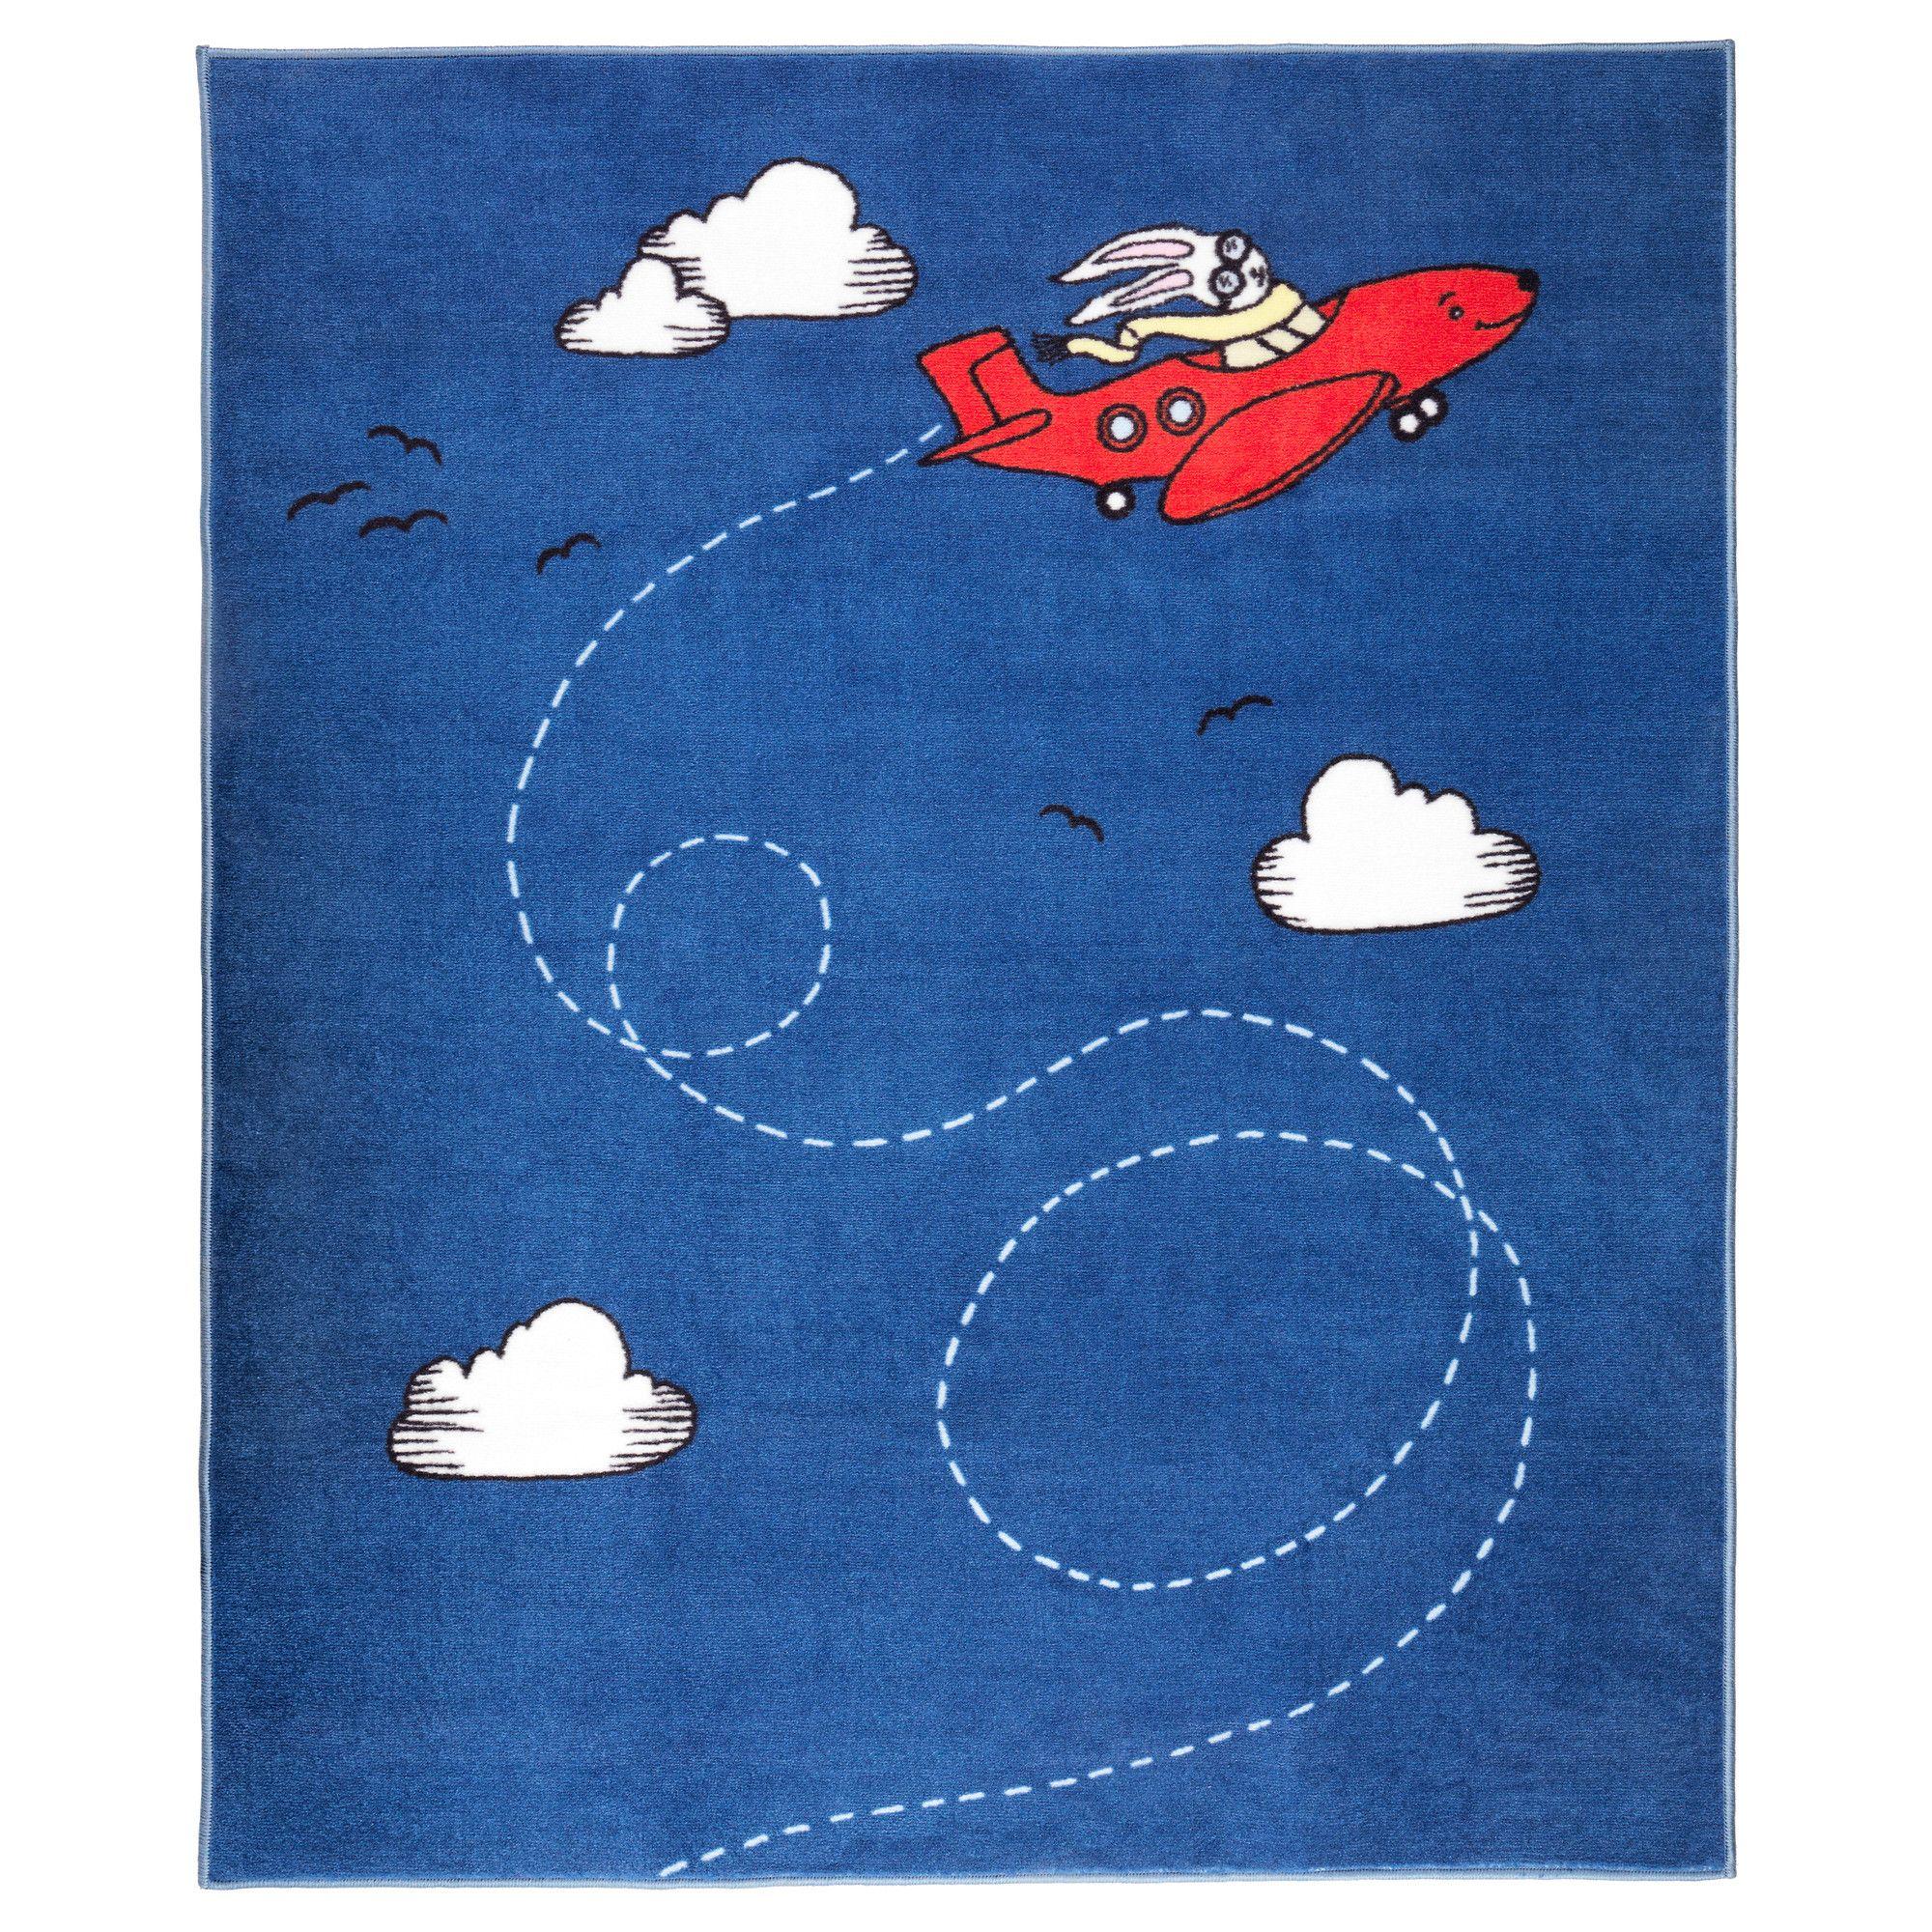 Flygtur tapis poils ras ikea enfants pinterest - Ikea tapis chambre ...